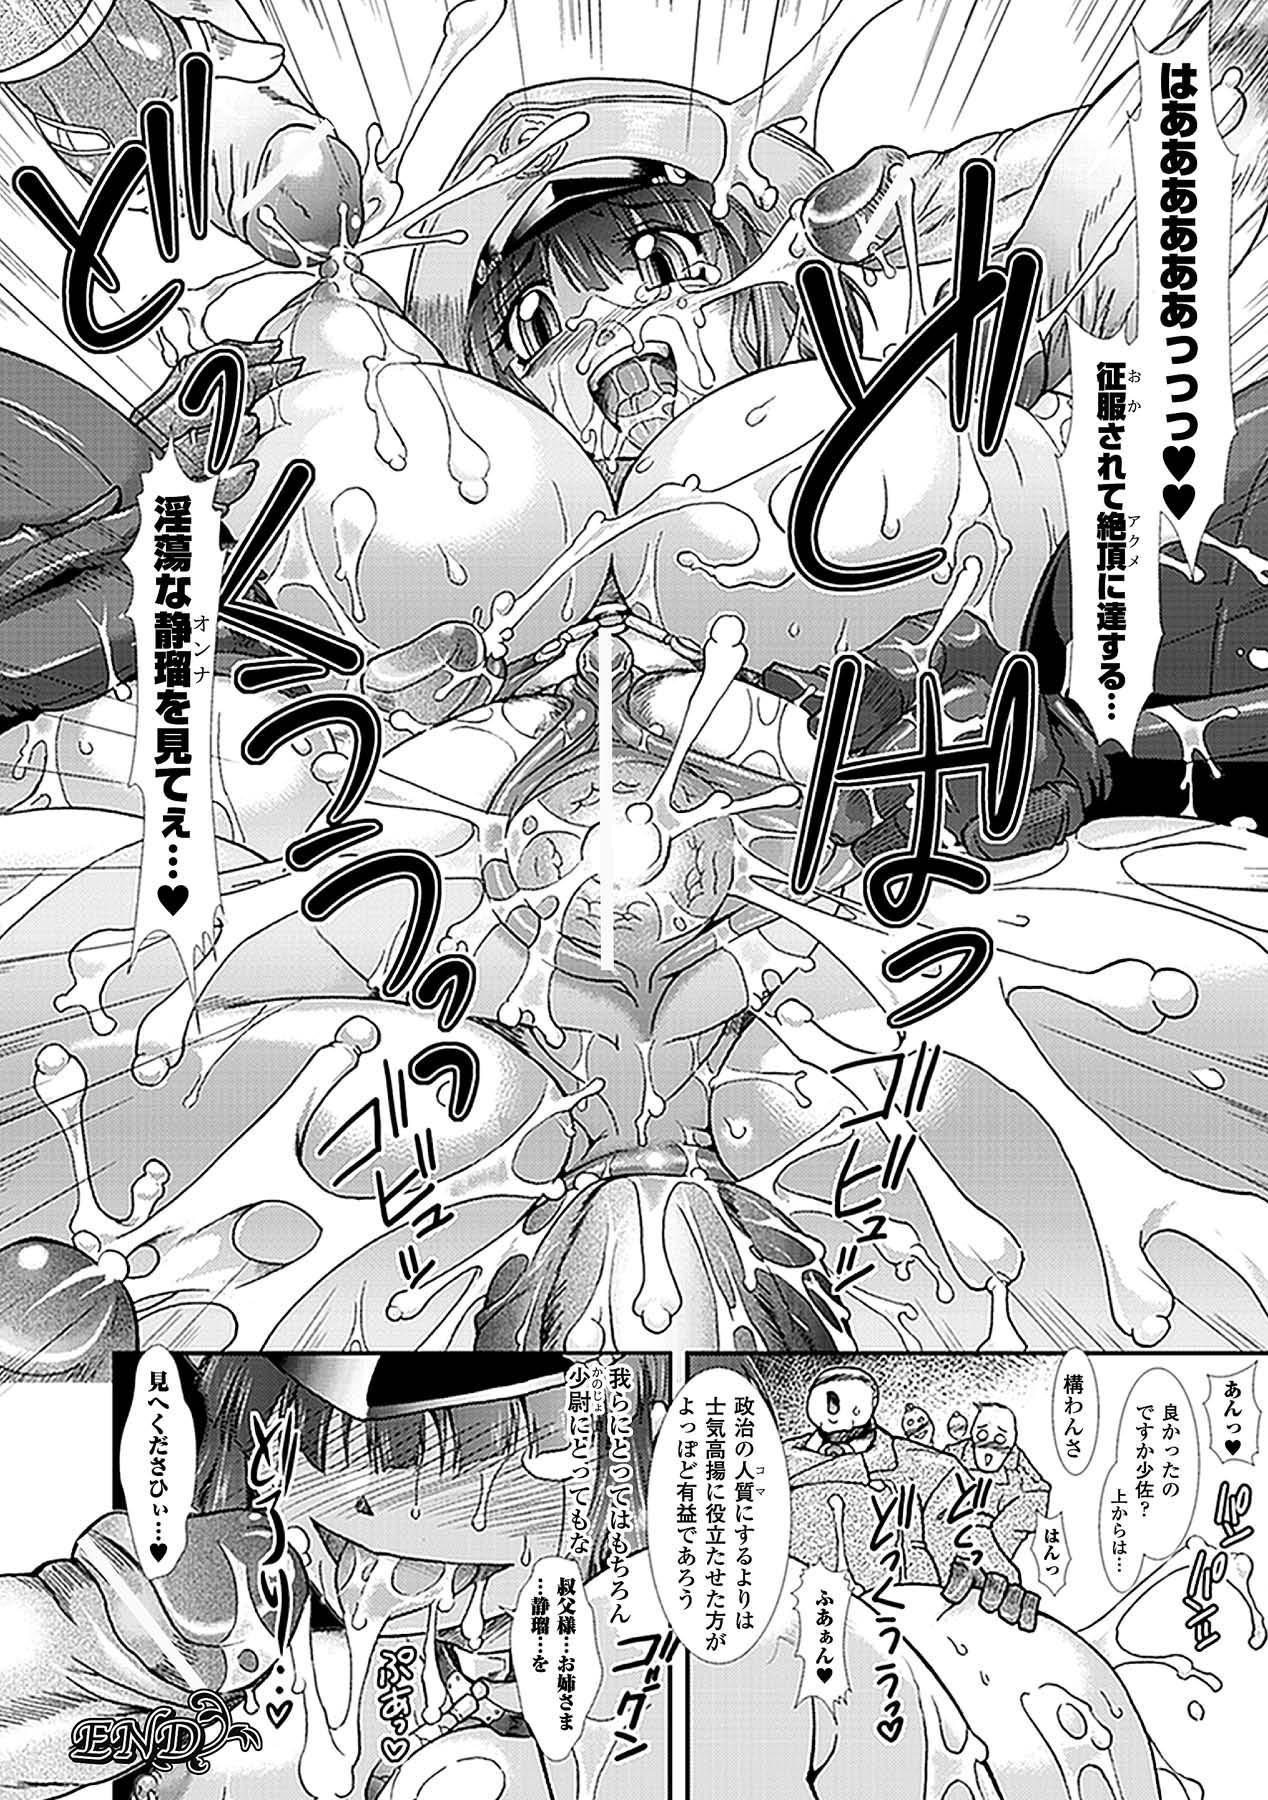 Kyousei Roshutsu Vol.1 Digital 63